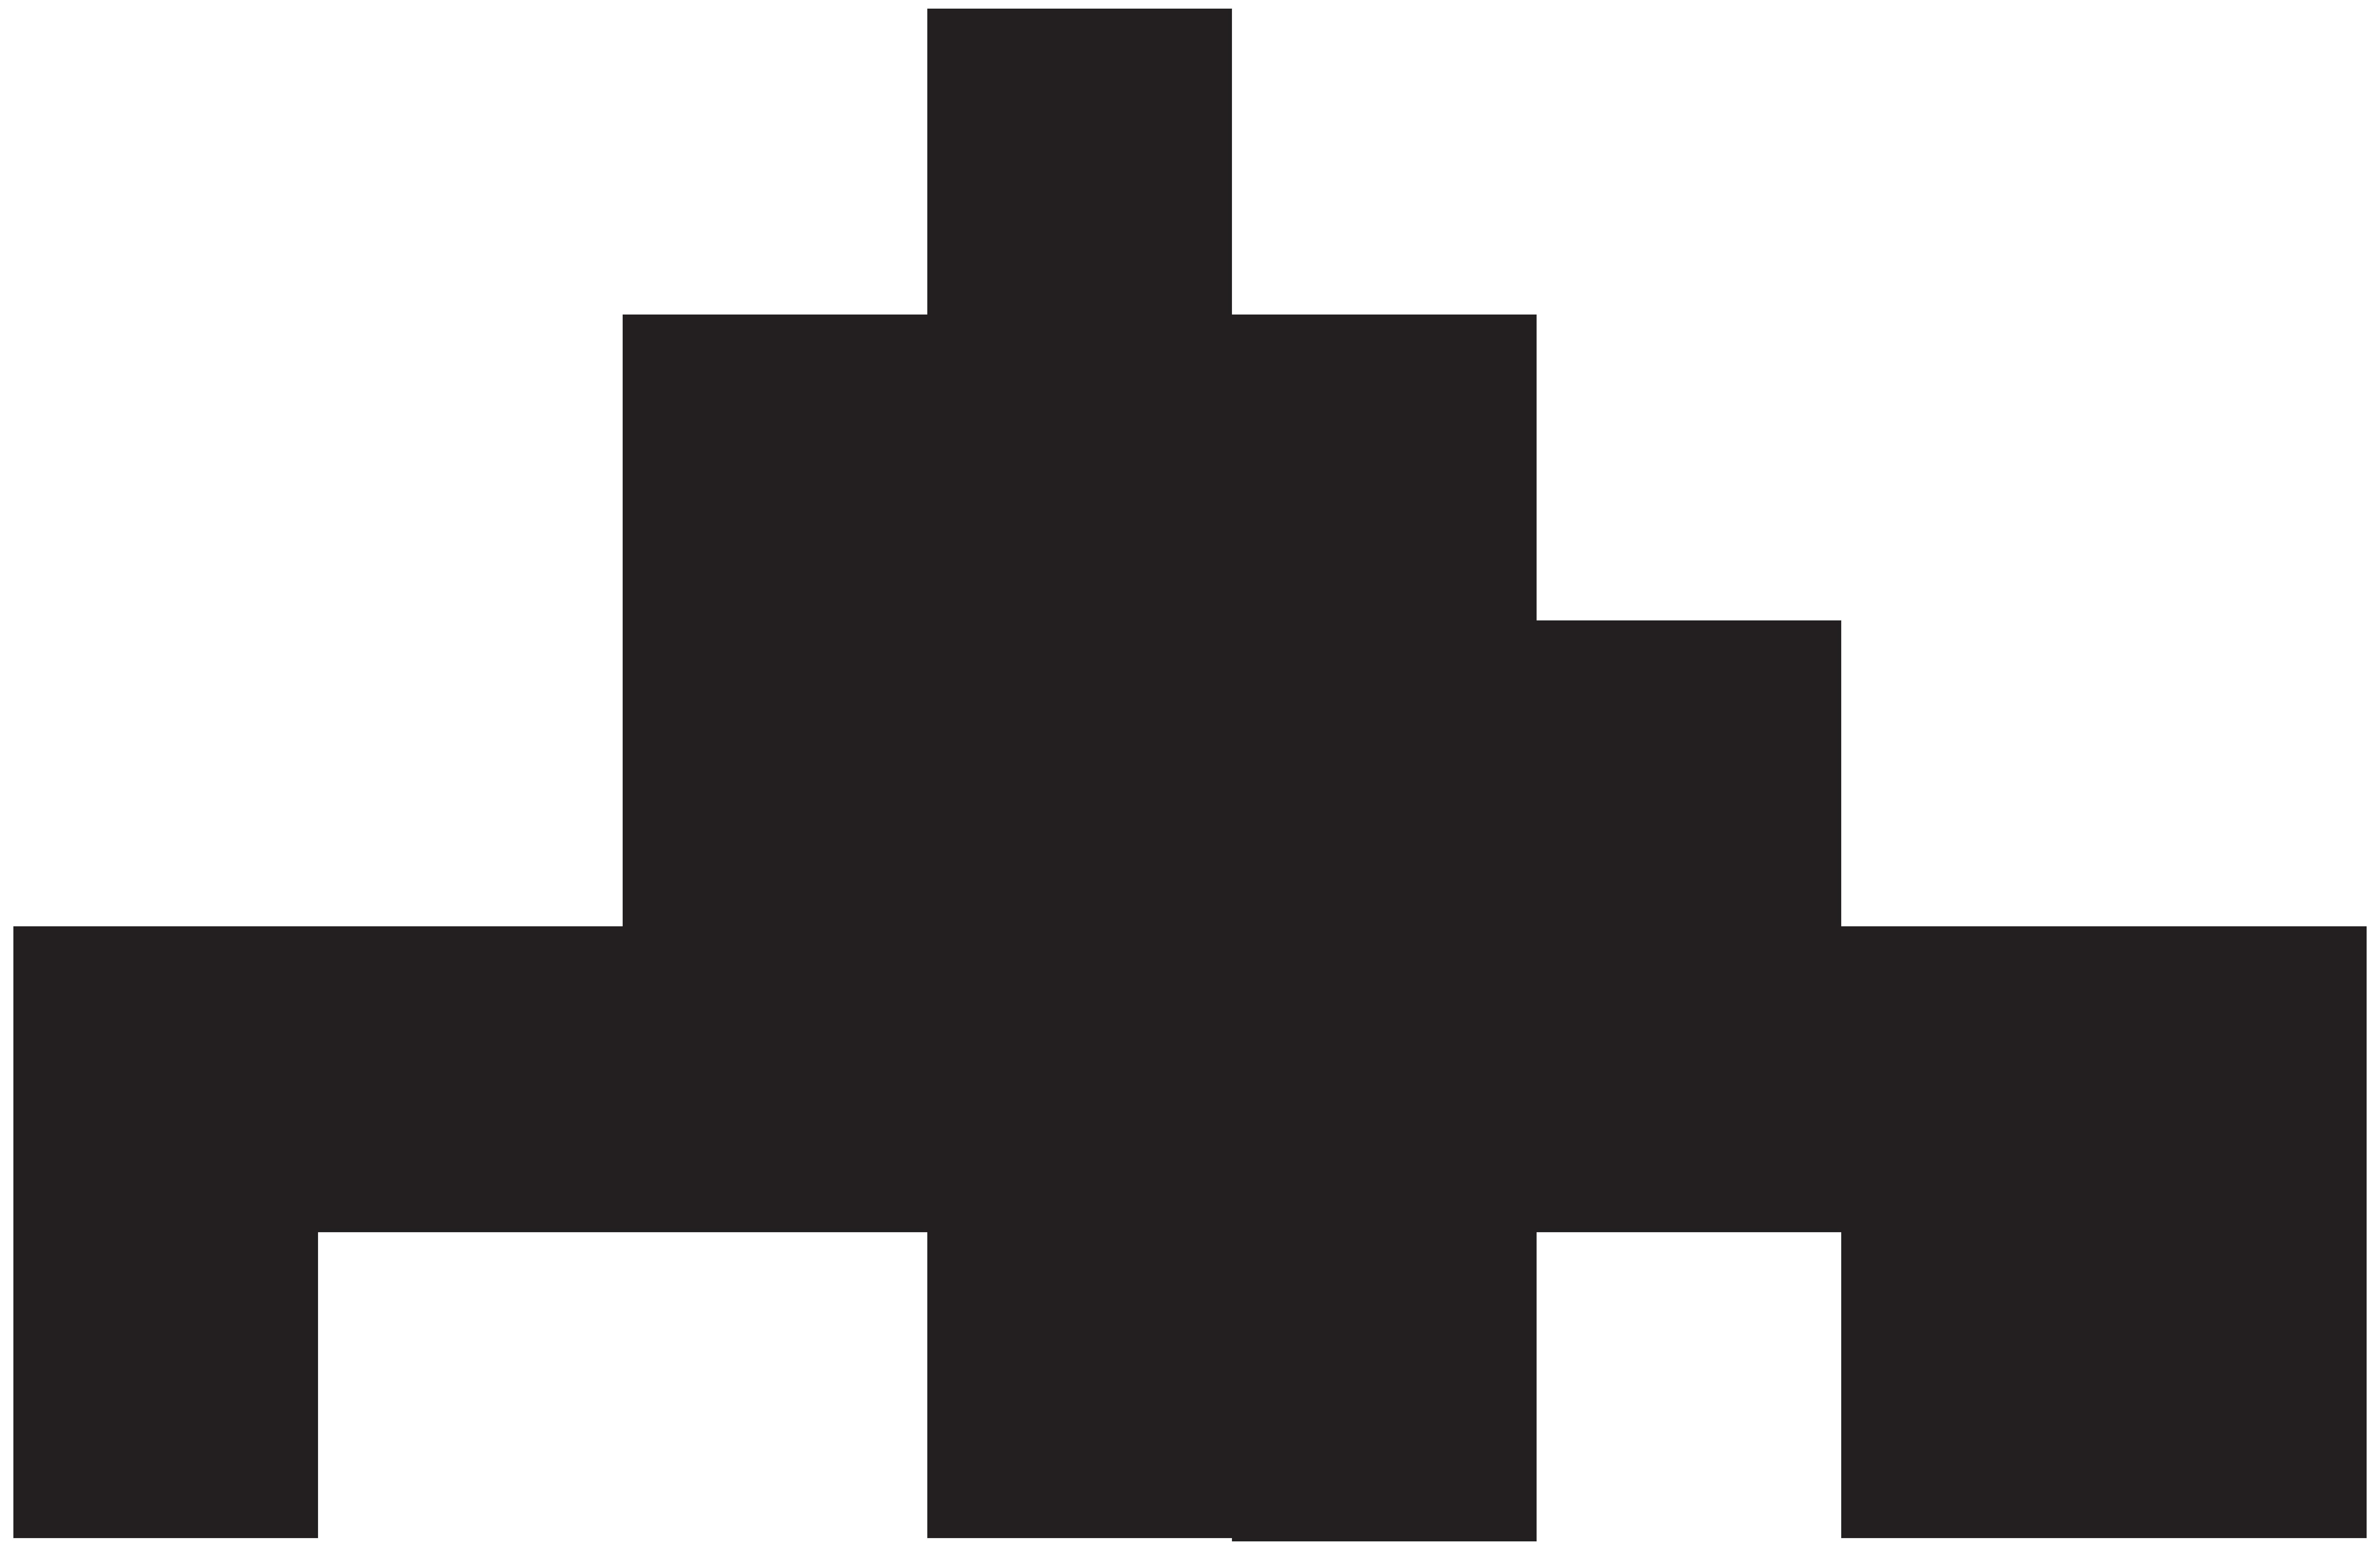 8000x5209 Shark Attack Silhouette Png Clip Art Imageu200b Gallery Yopriceville